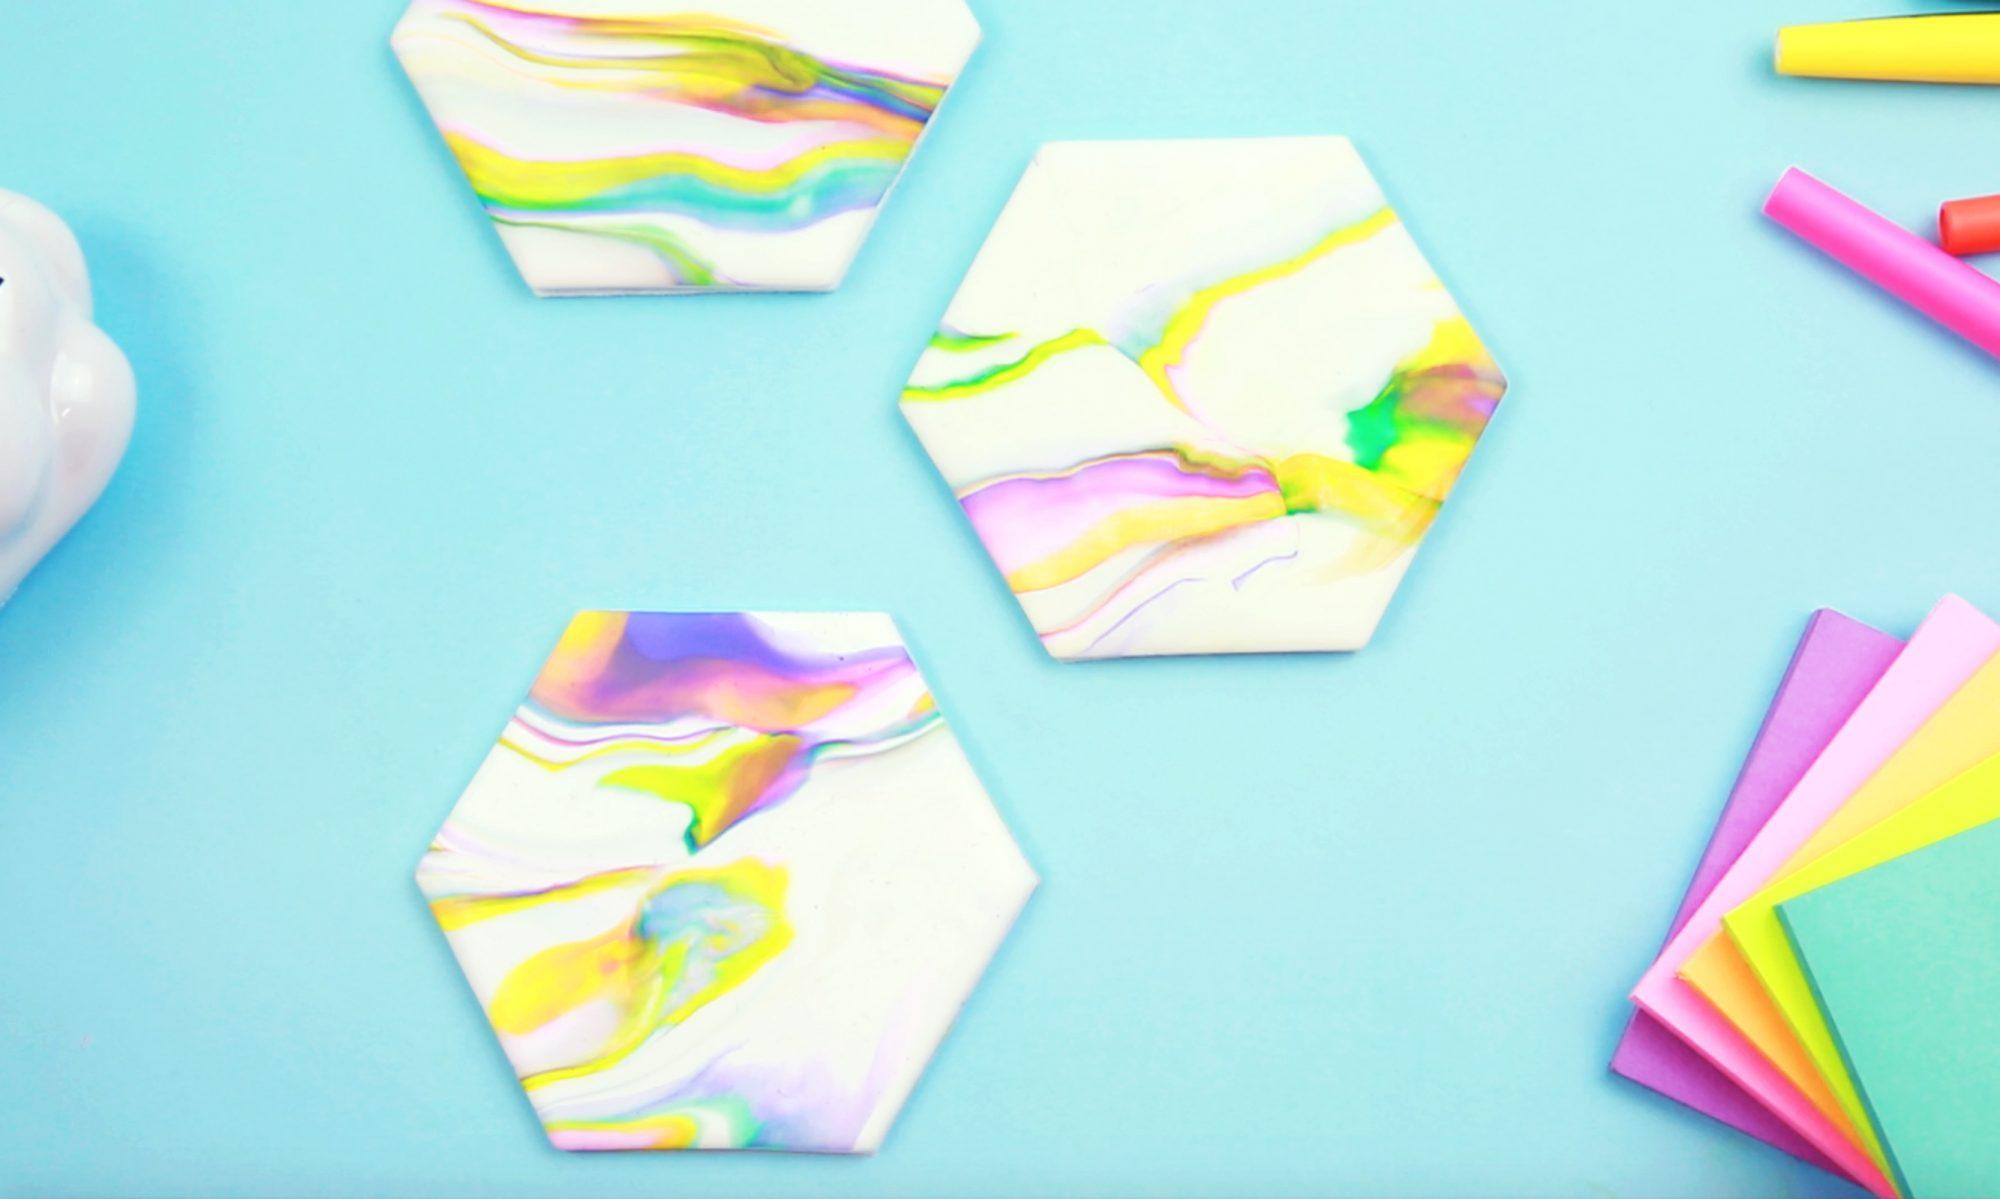 DIY Rainbow Marble Coasters